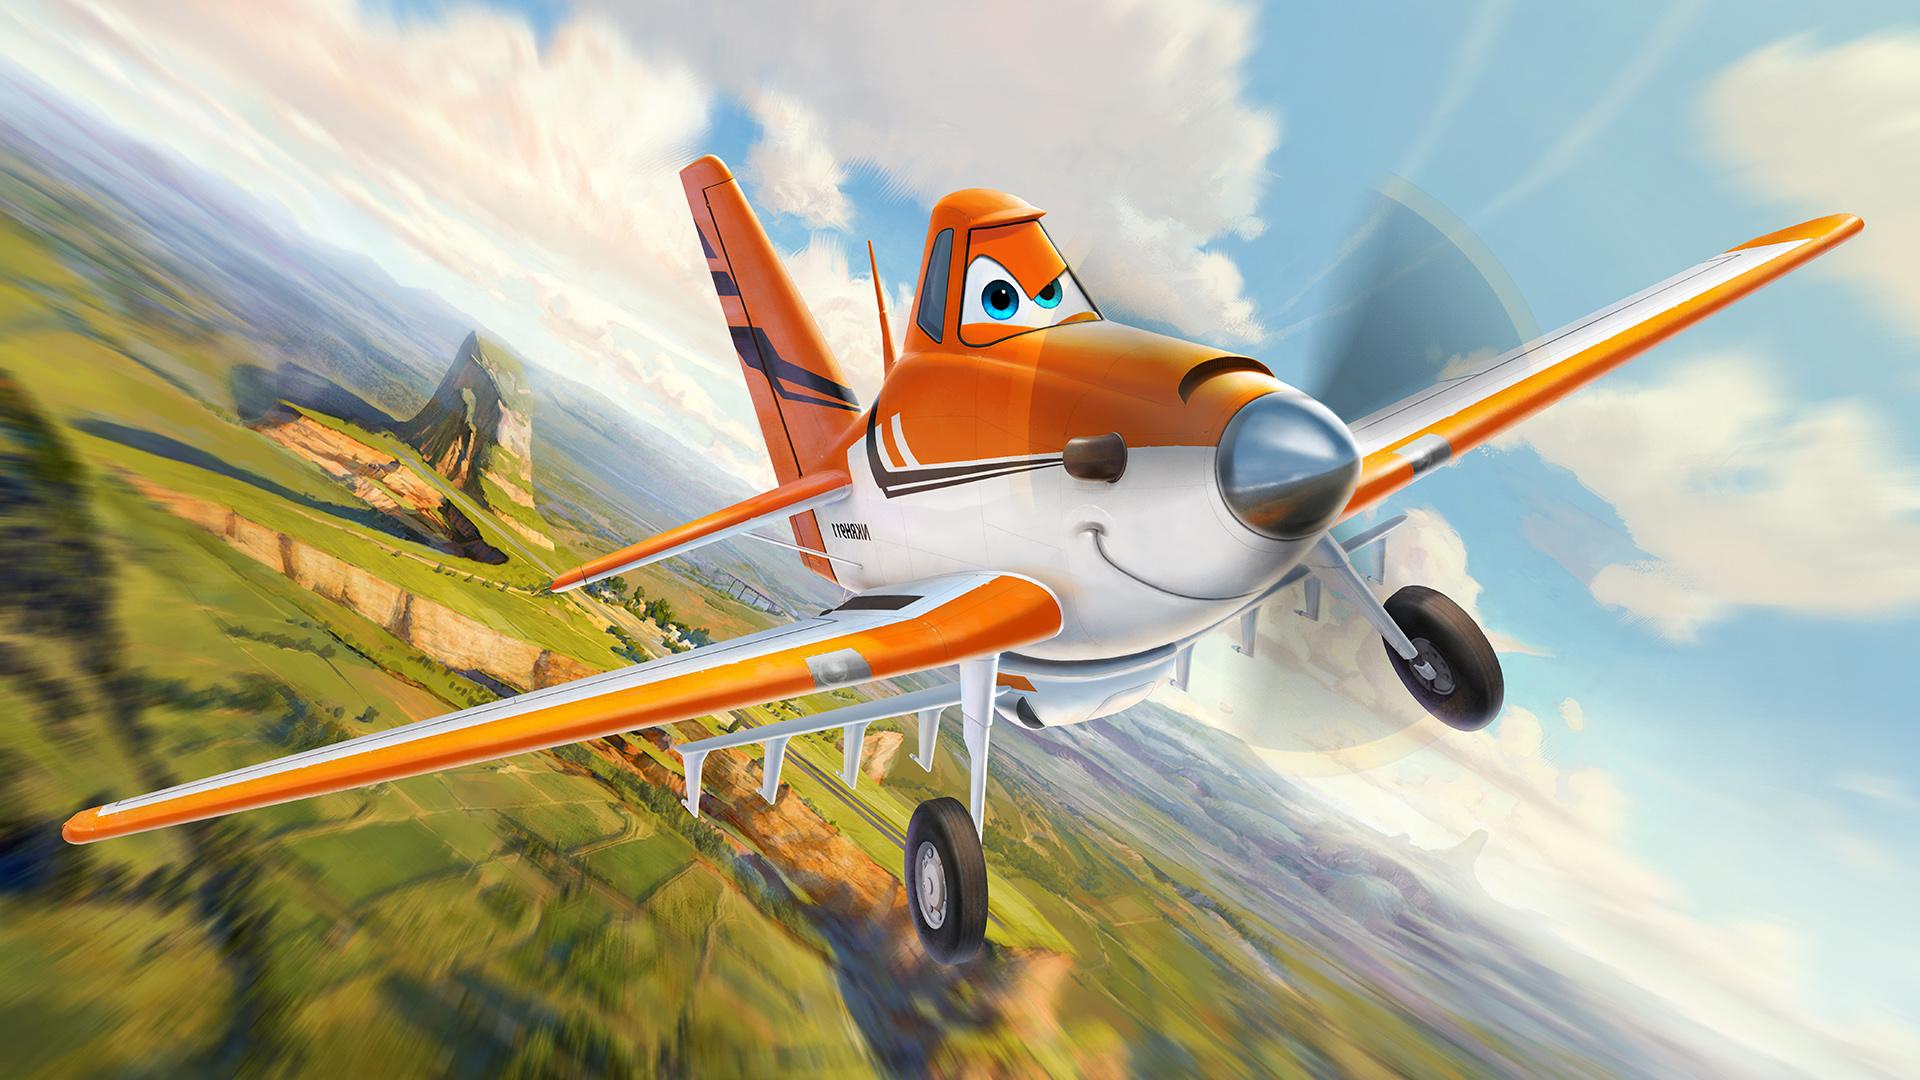 Hd Aeroplane Wallpapers For Desktop Planes Movie Archives Hdwallsource Com Hdwallsource Com